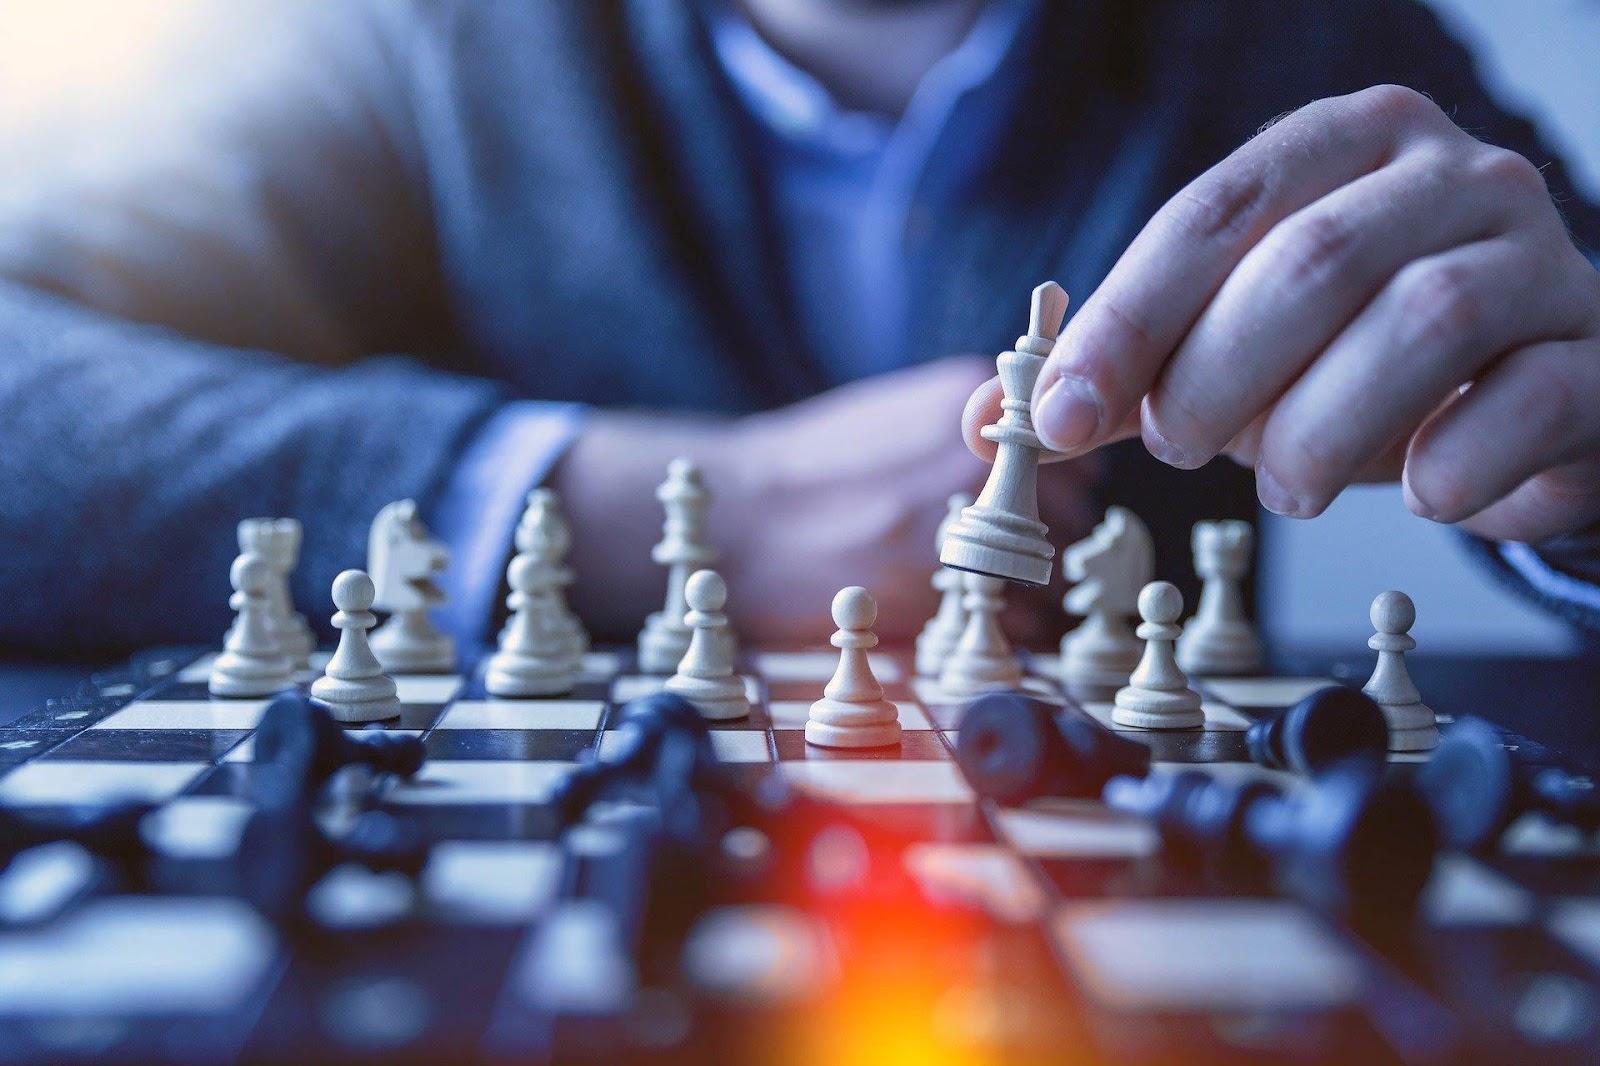 https://vendre-ses-photos-en-ligne.com/wp-content/uploads/2020/03/chess-3325010_1920.jpg